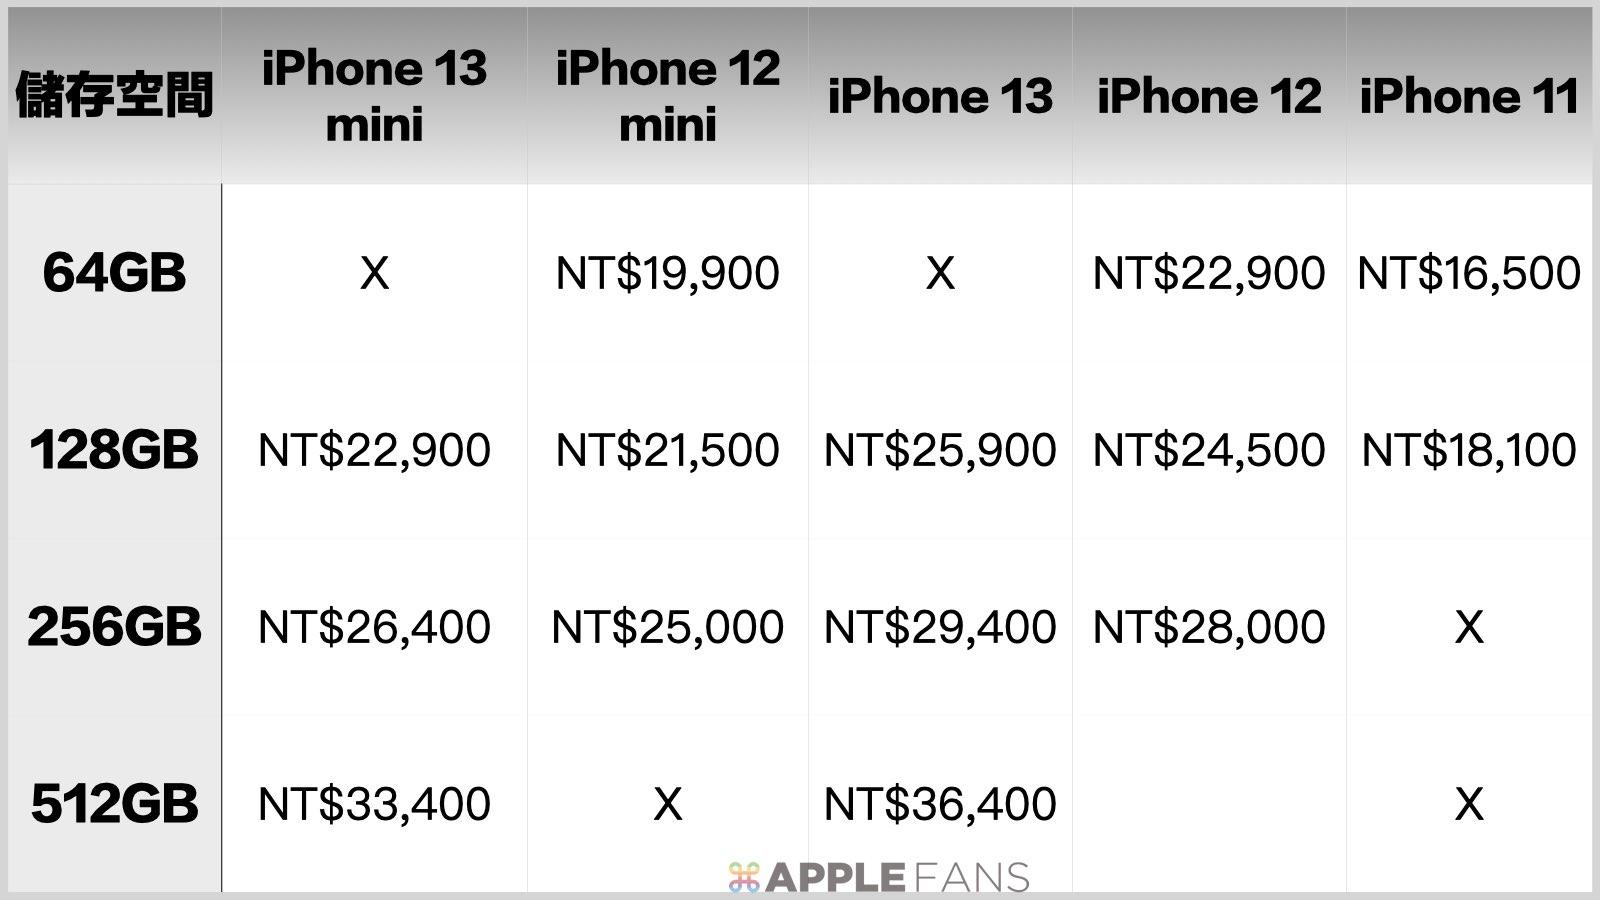 價格比一比 - iPhone 13 mini : iPhone 13 : iPhone 12 mimi : iPhone 12 : iPhone 11.001